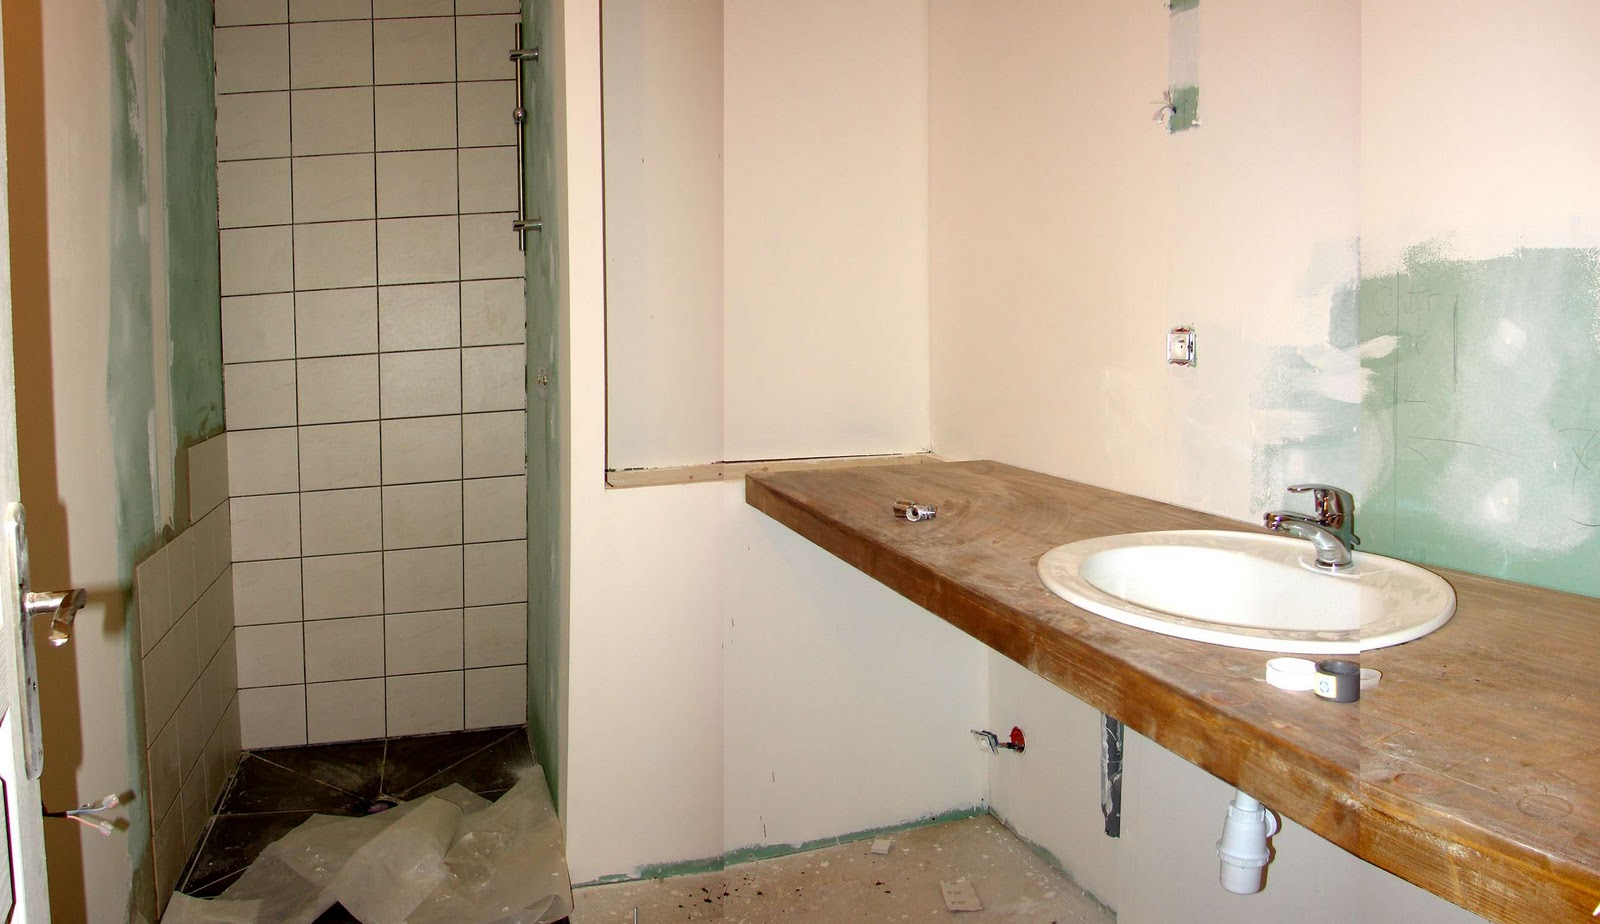 Eiken Werkblad Badkamer : Houten blad badkamer